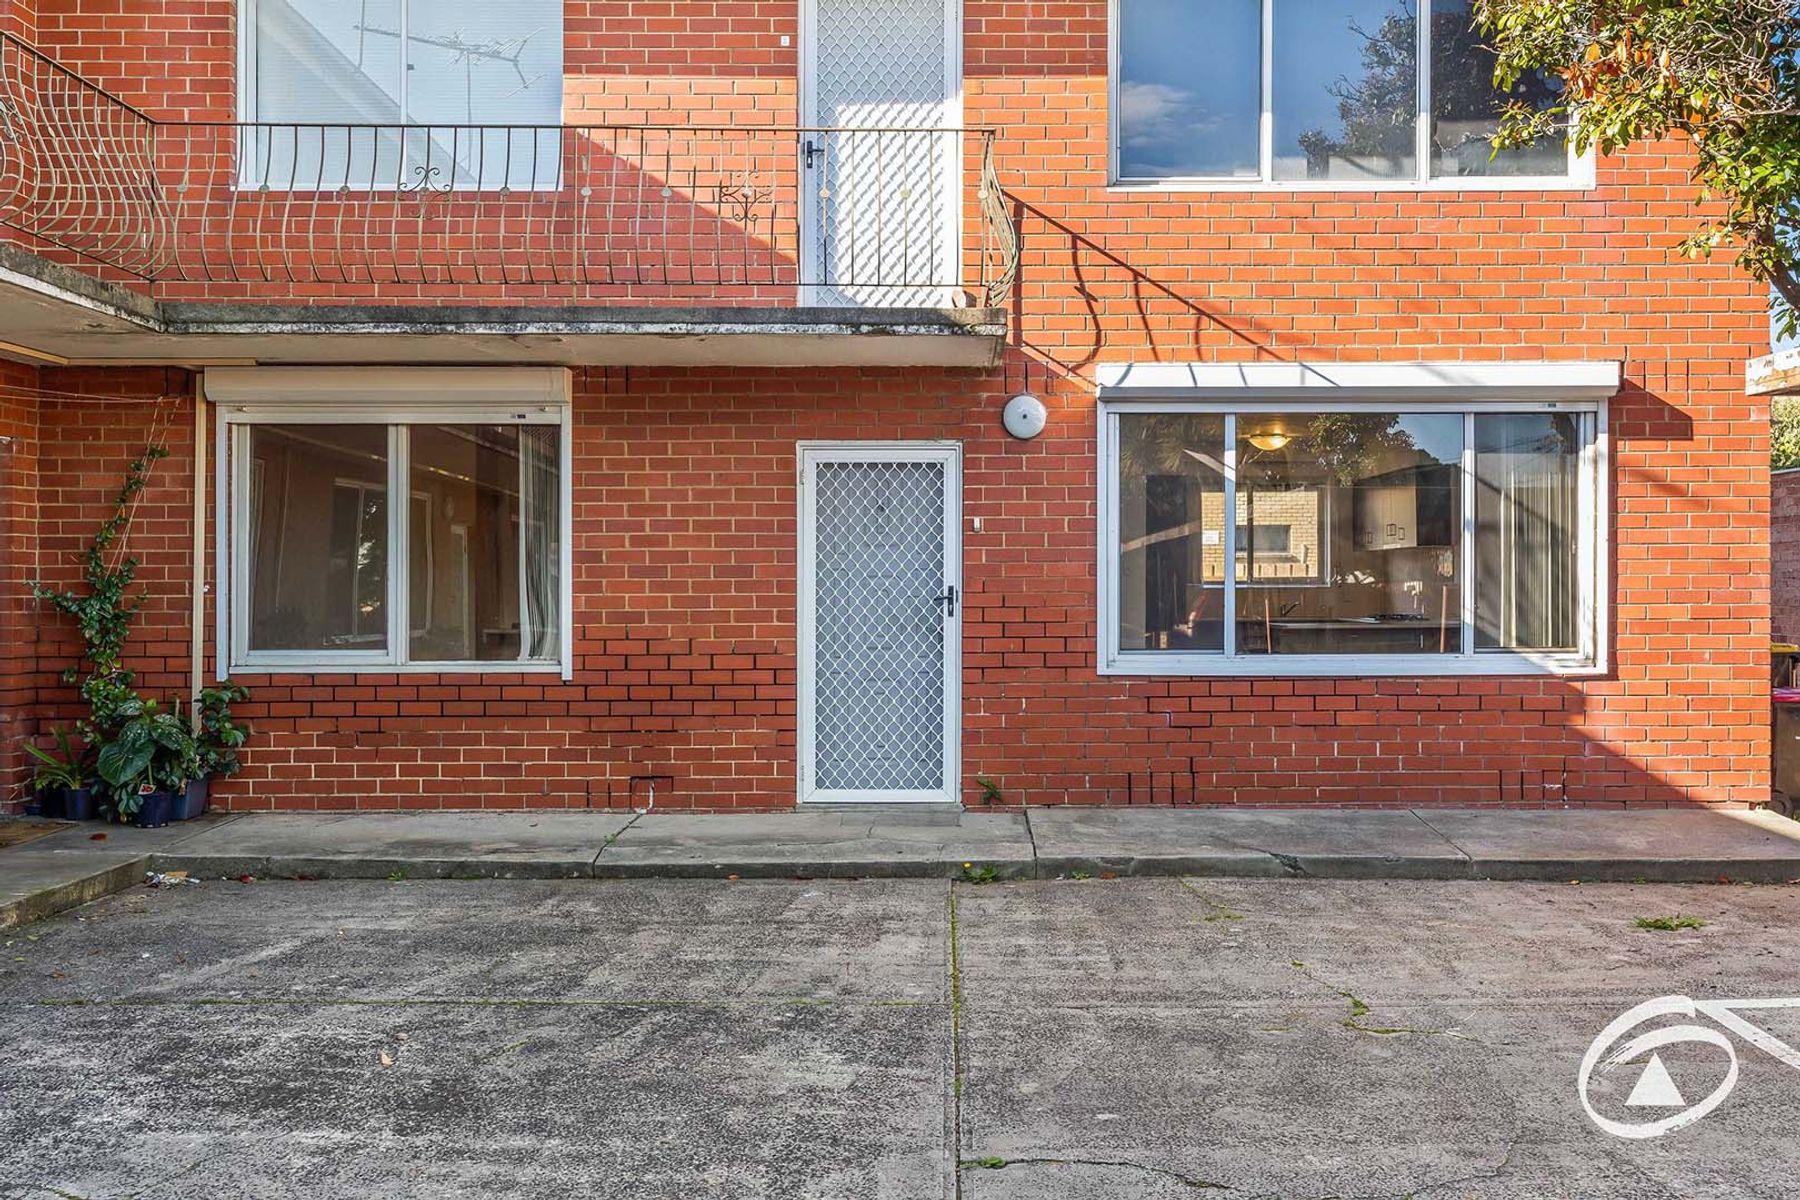 4/4-6 Keys Street, Dandenong, VIC 3175